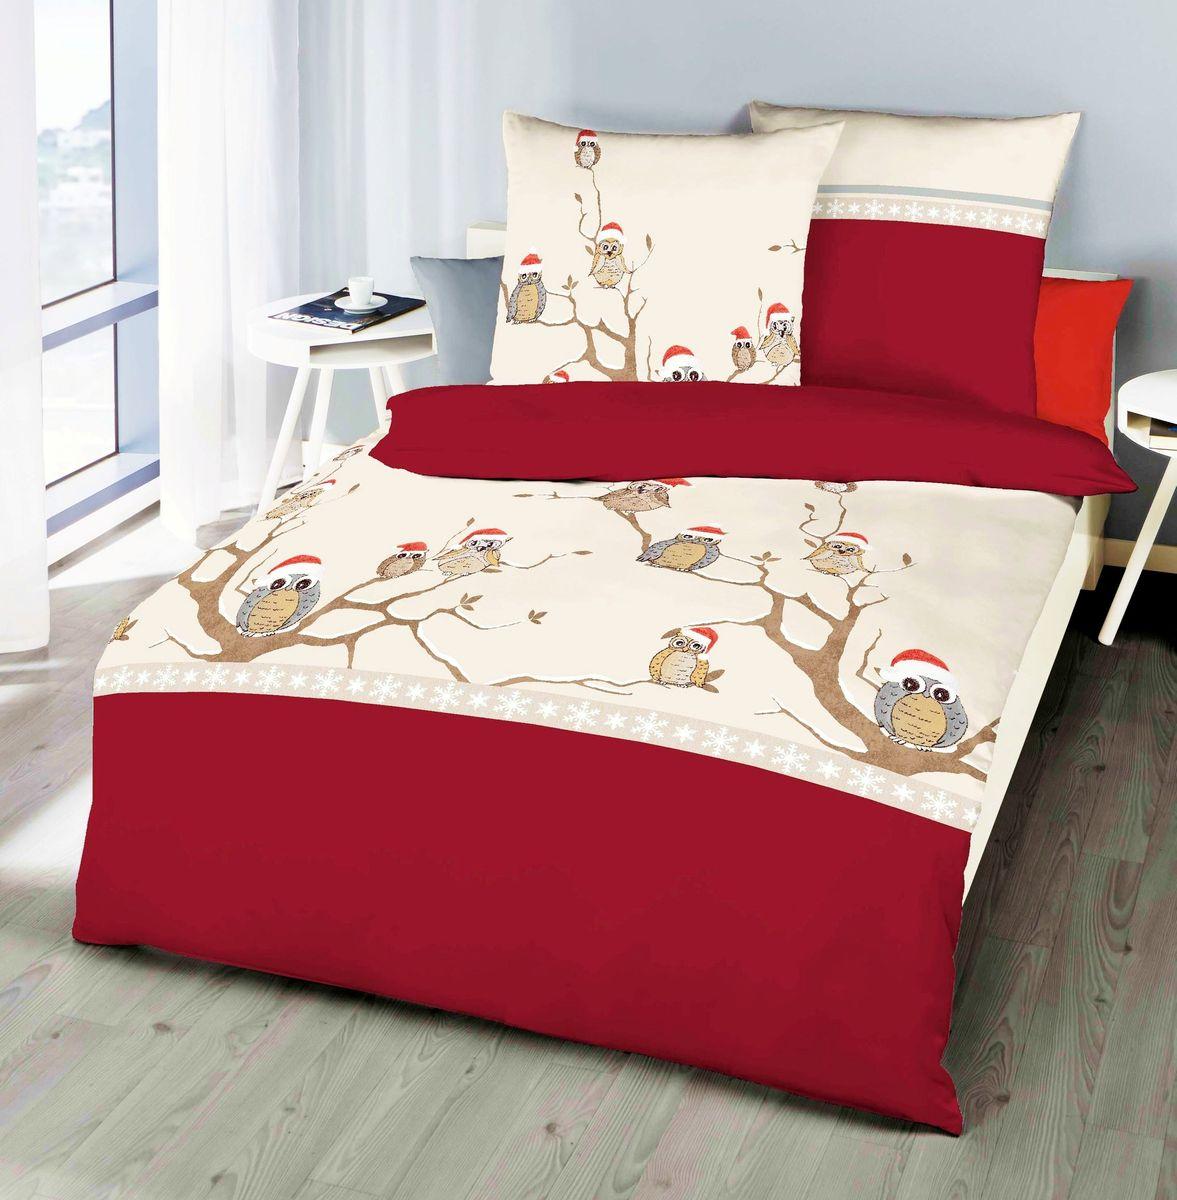 kaeppel fein biber bettw sche 2 tlg wintereule rot anthrazit braun creme bettw sche bettw sche. Black Bedroom Furniture Sets. Home Design Ideas